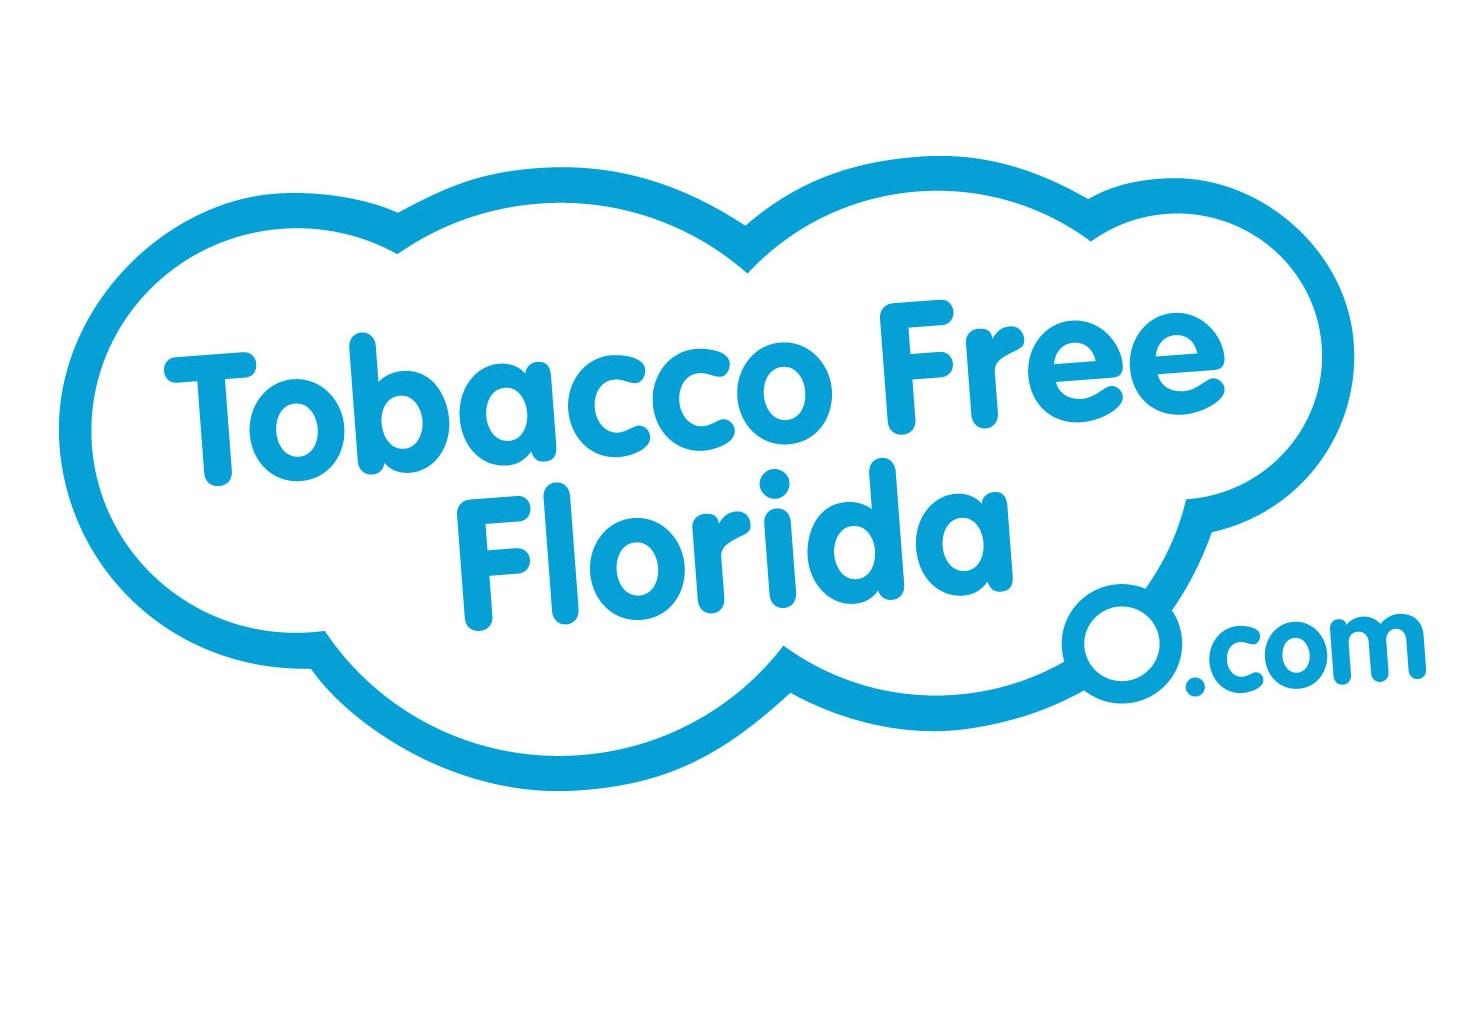 Sopchoppy Worm Gruntin' Festival 5K Sponsor - Tobacco Free Florida